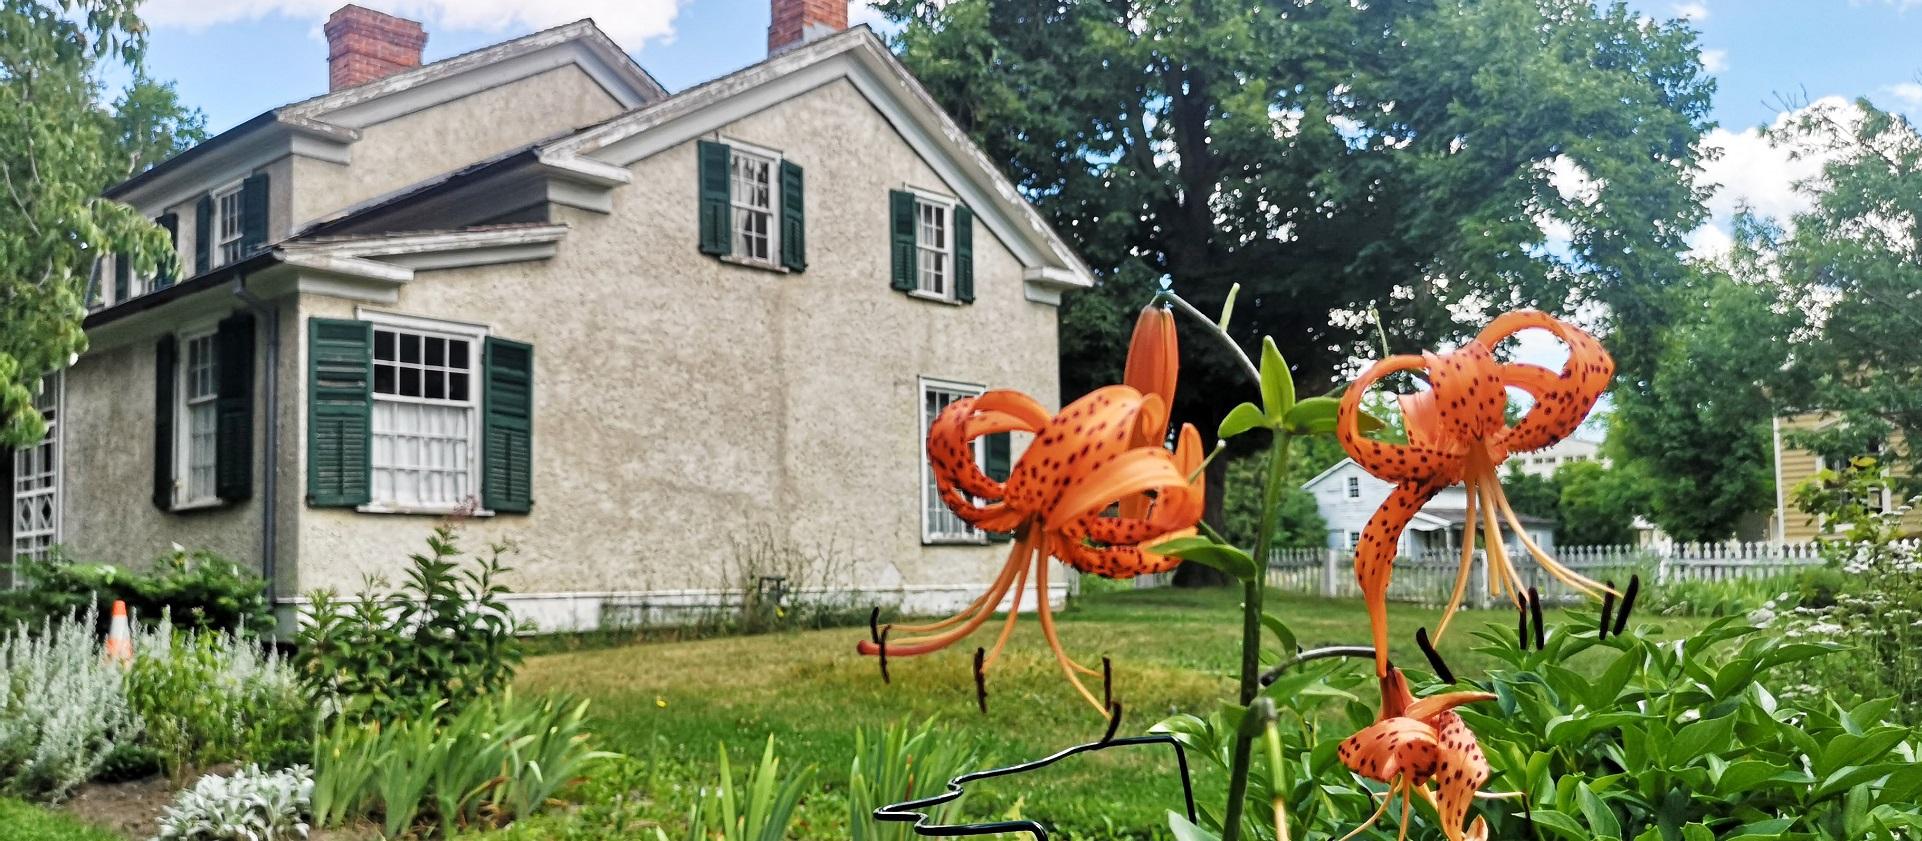 historic home and garden at Black Creek Pioneer Village